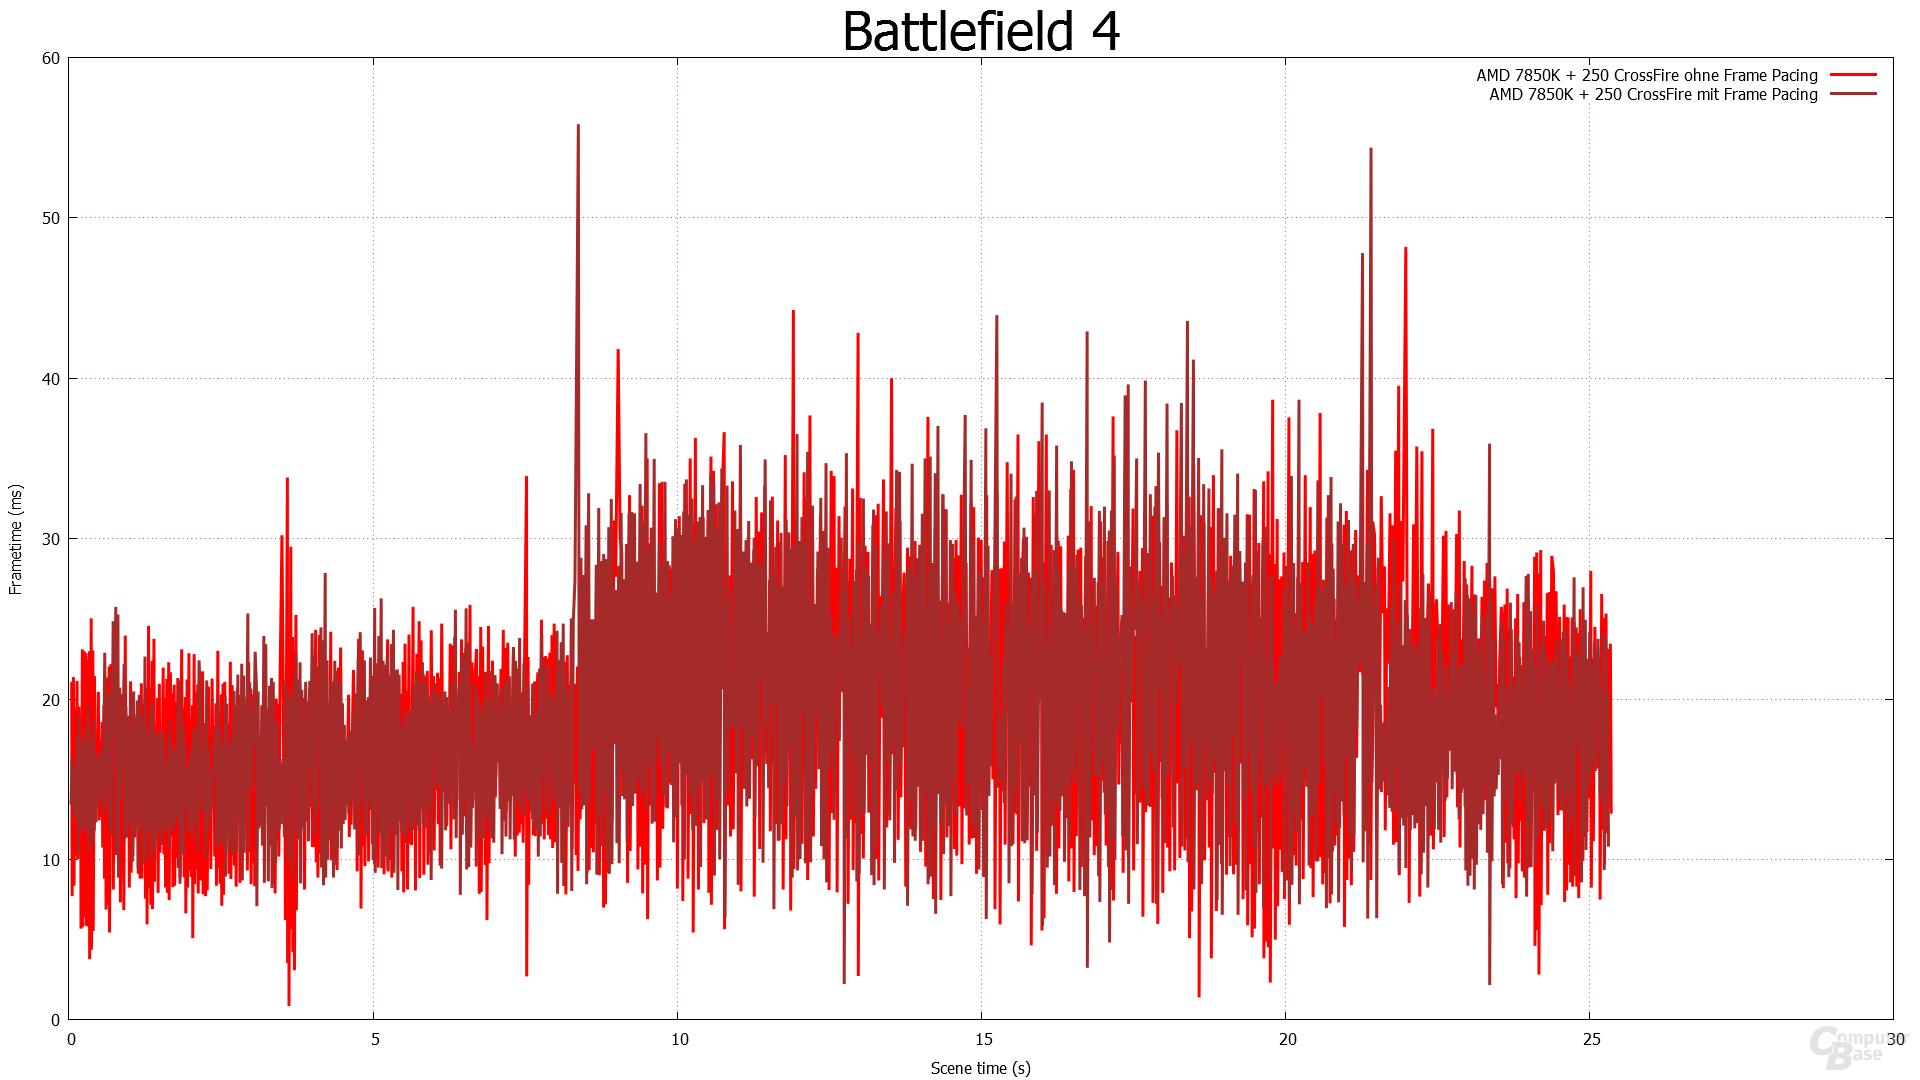 Frame Pacing - Battlefield 4